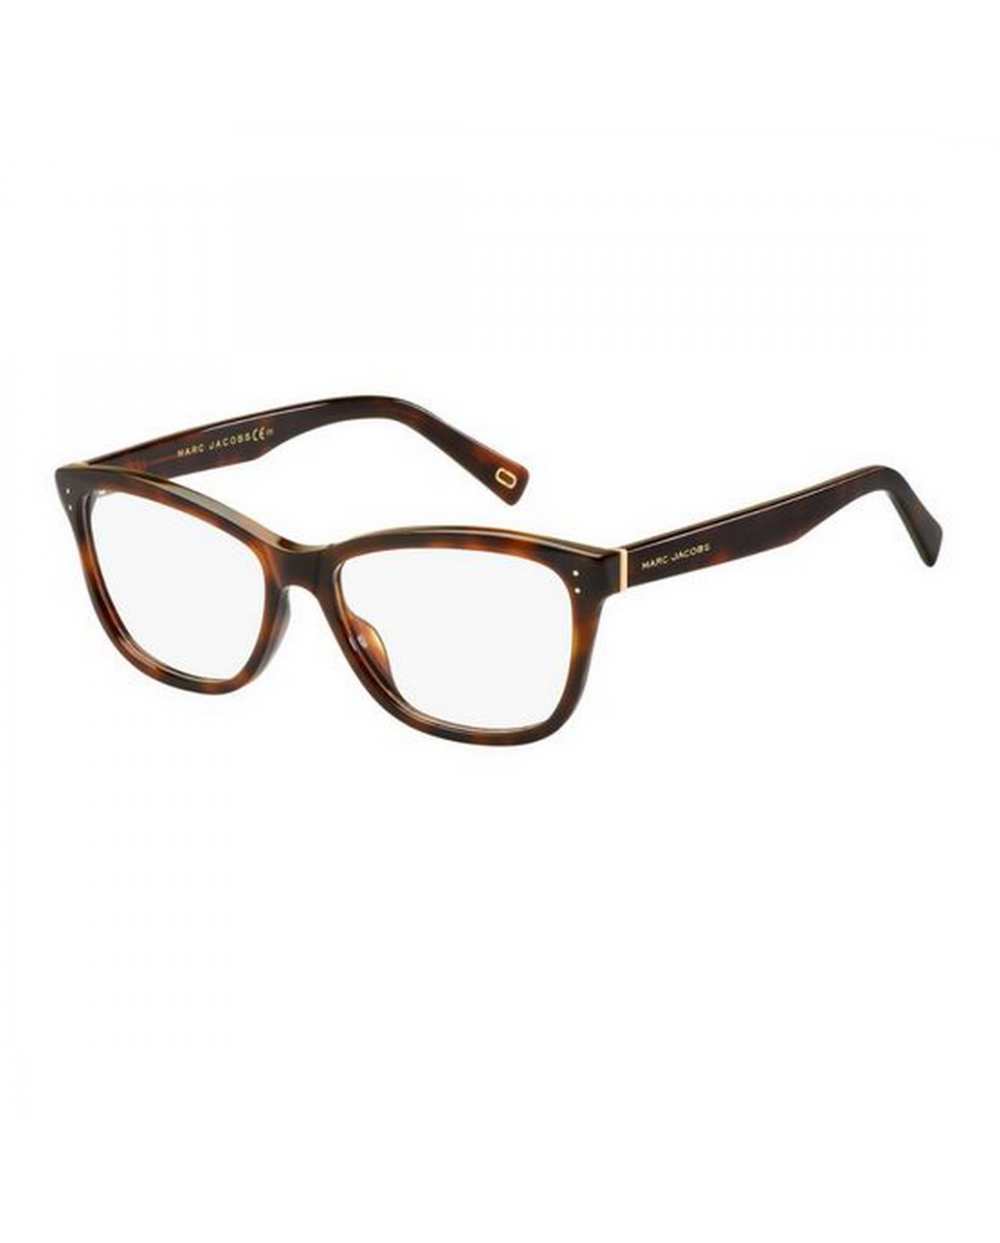 Glasses eyeglasses Marc Jacobs MARC 123 original packaging warranty italy